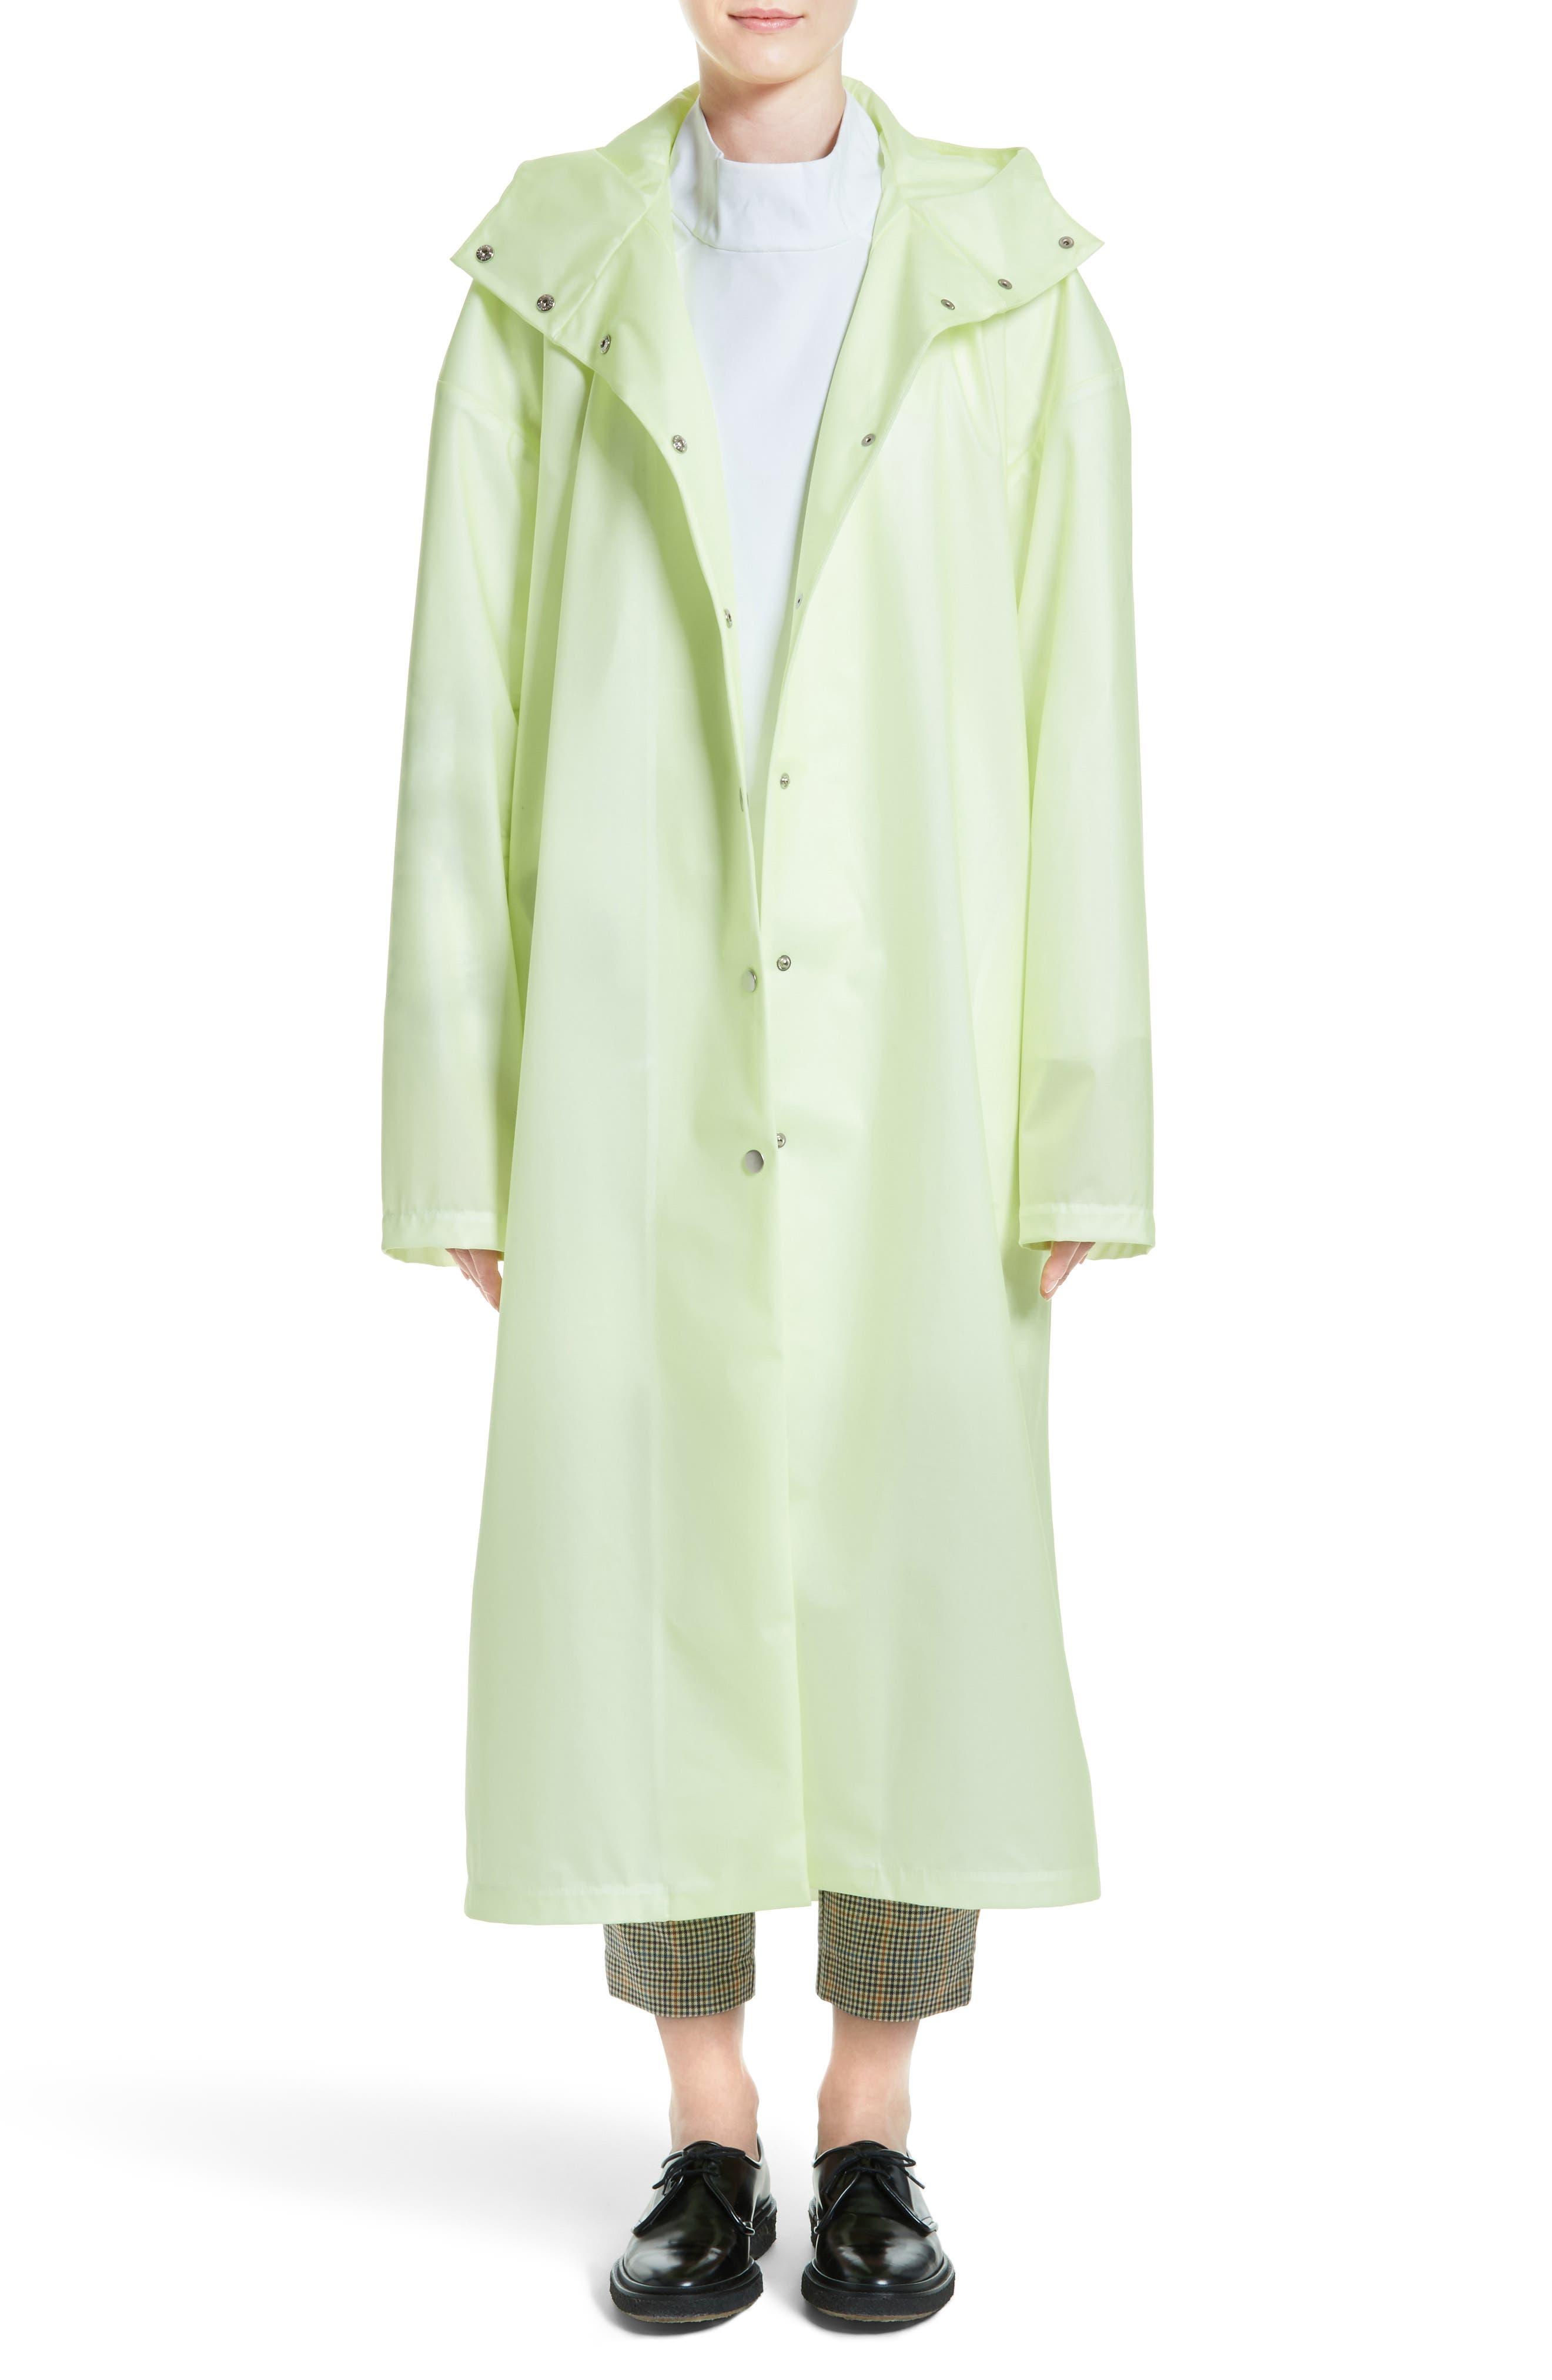 Alternate Image 1 Selected - A.W.A.K.E. Oversize Waterproof Hooded Coat